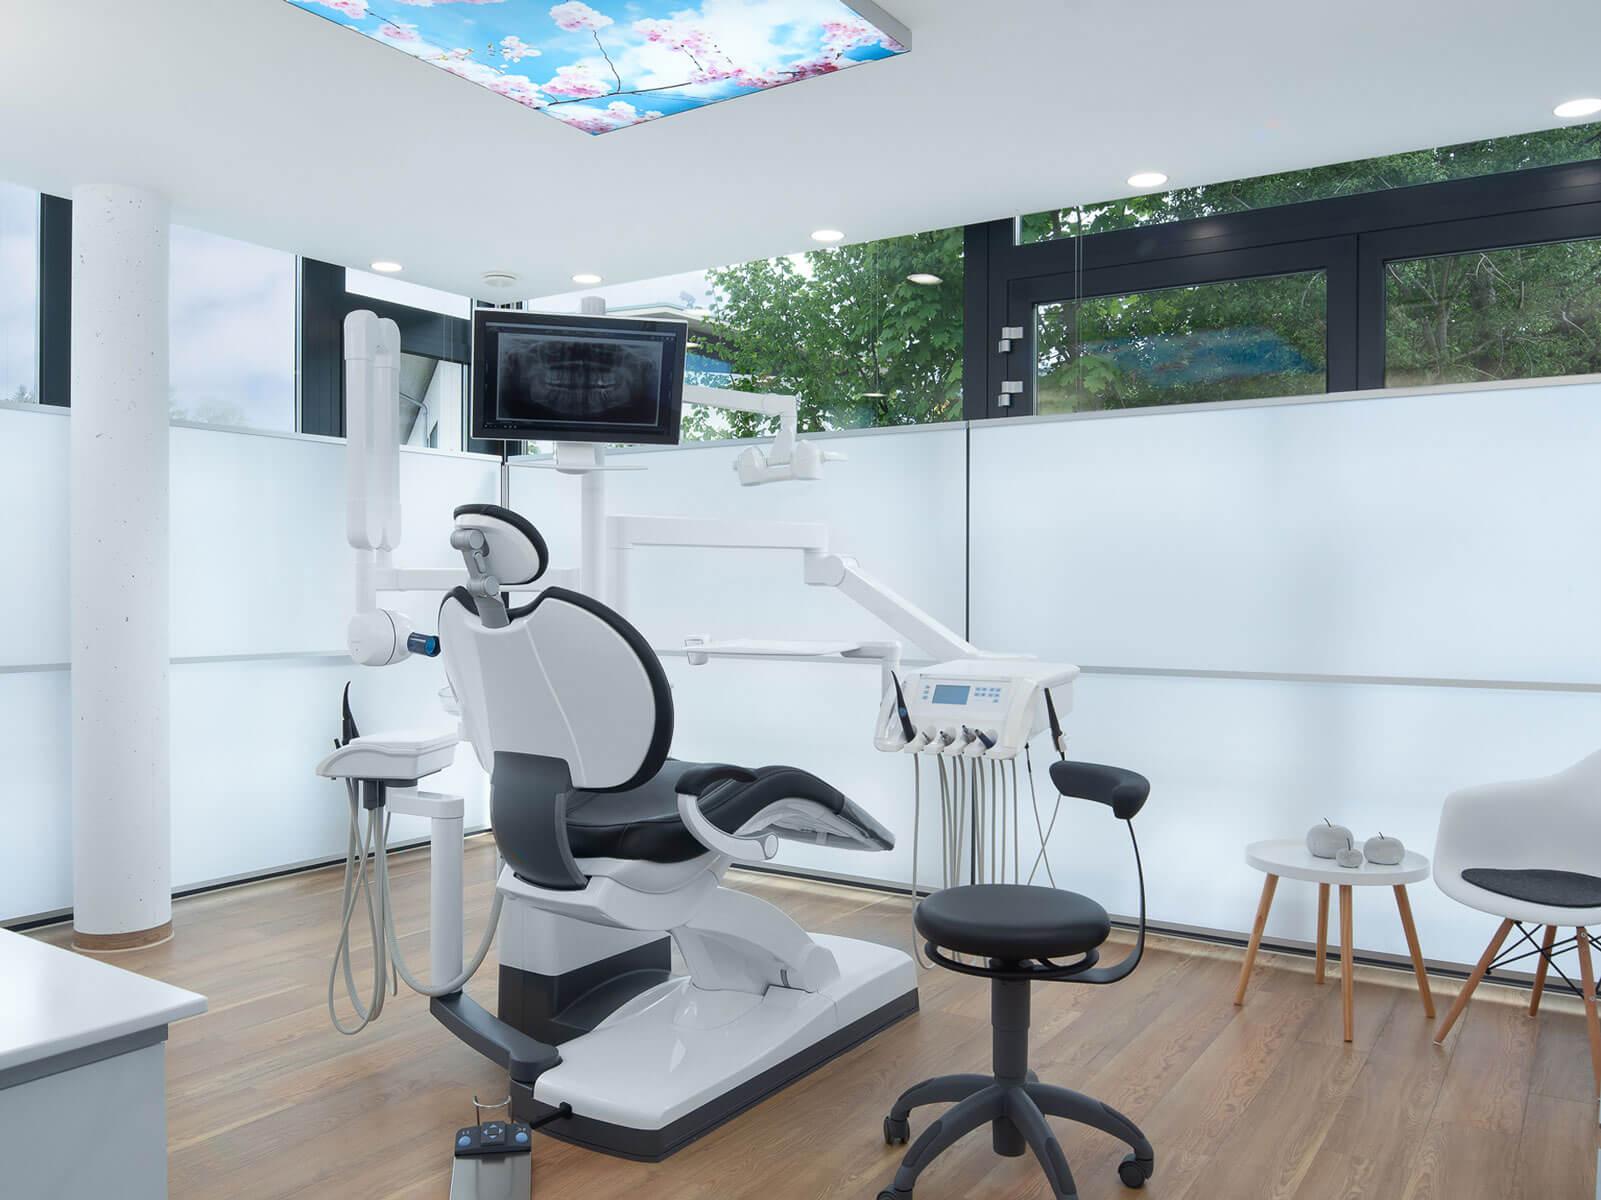 ZA Praxis in Bernau am Chiemsee / Behandlung